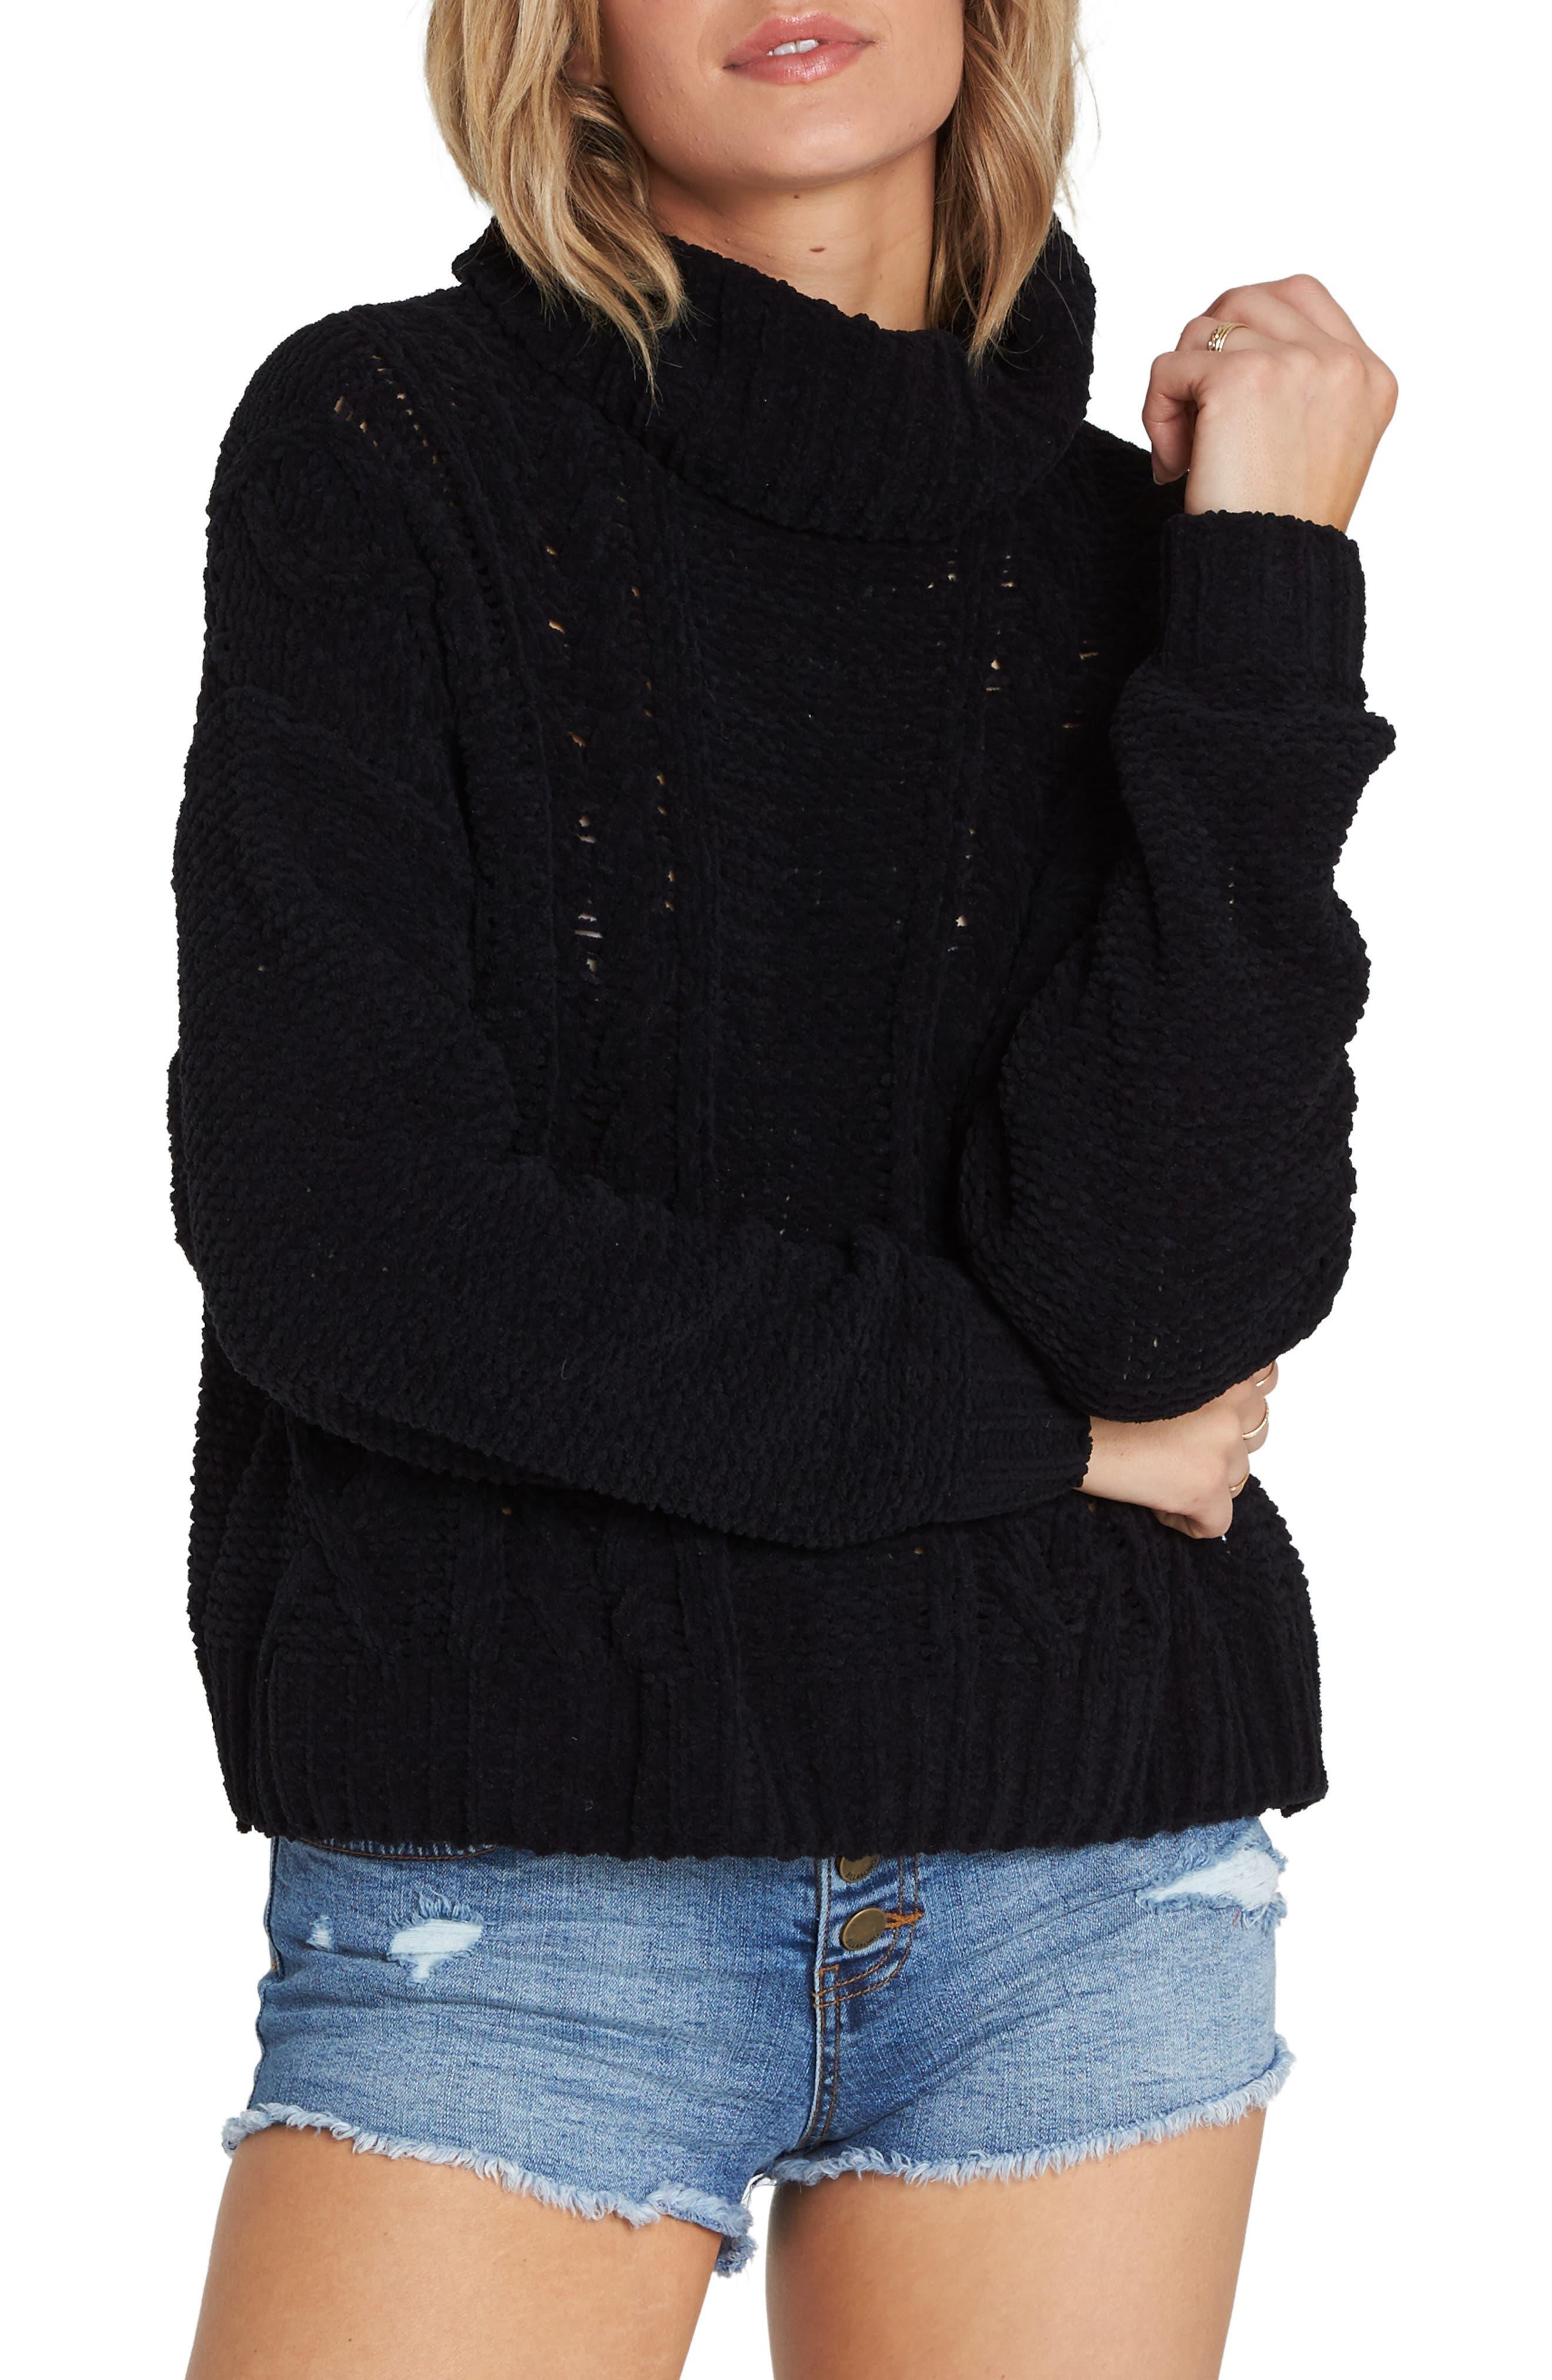 BILLABONG, Cable Knit Turtleneck Sweater, Main thumbnail 1, color, 001